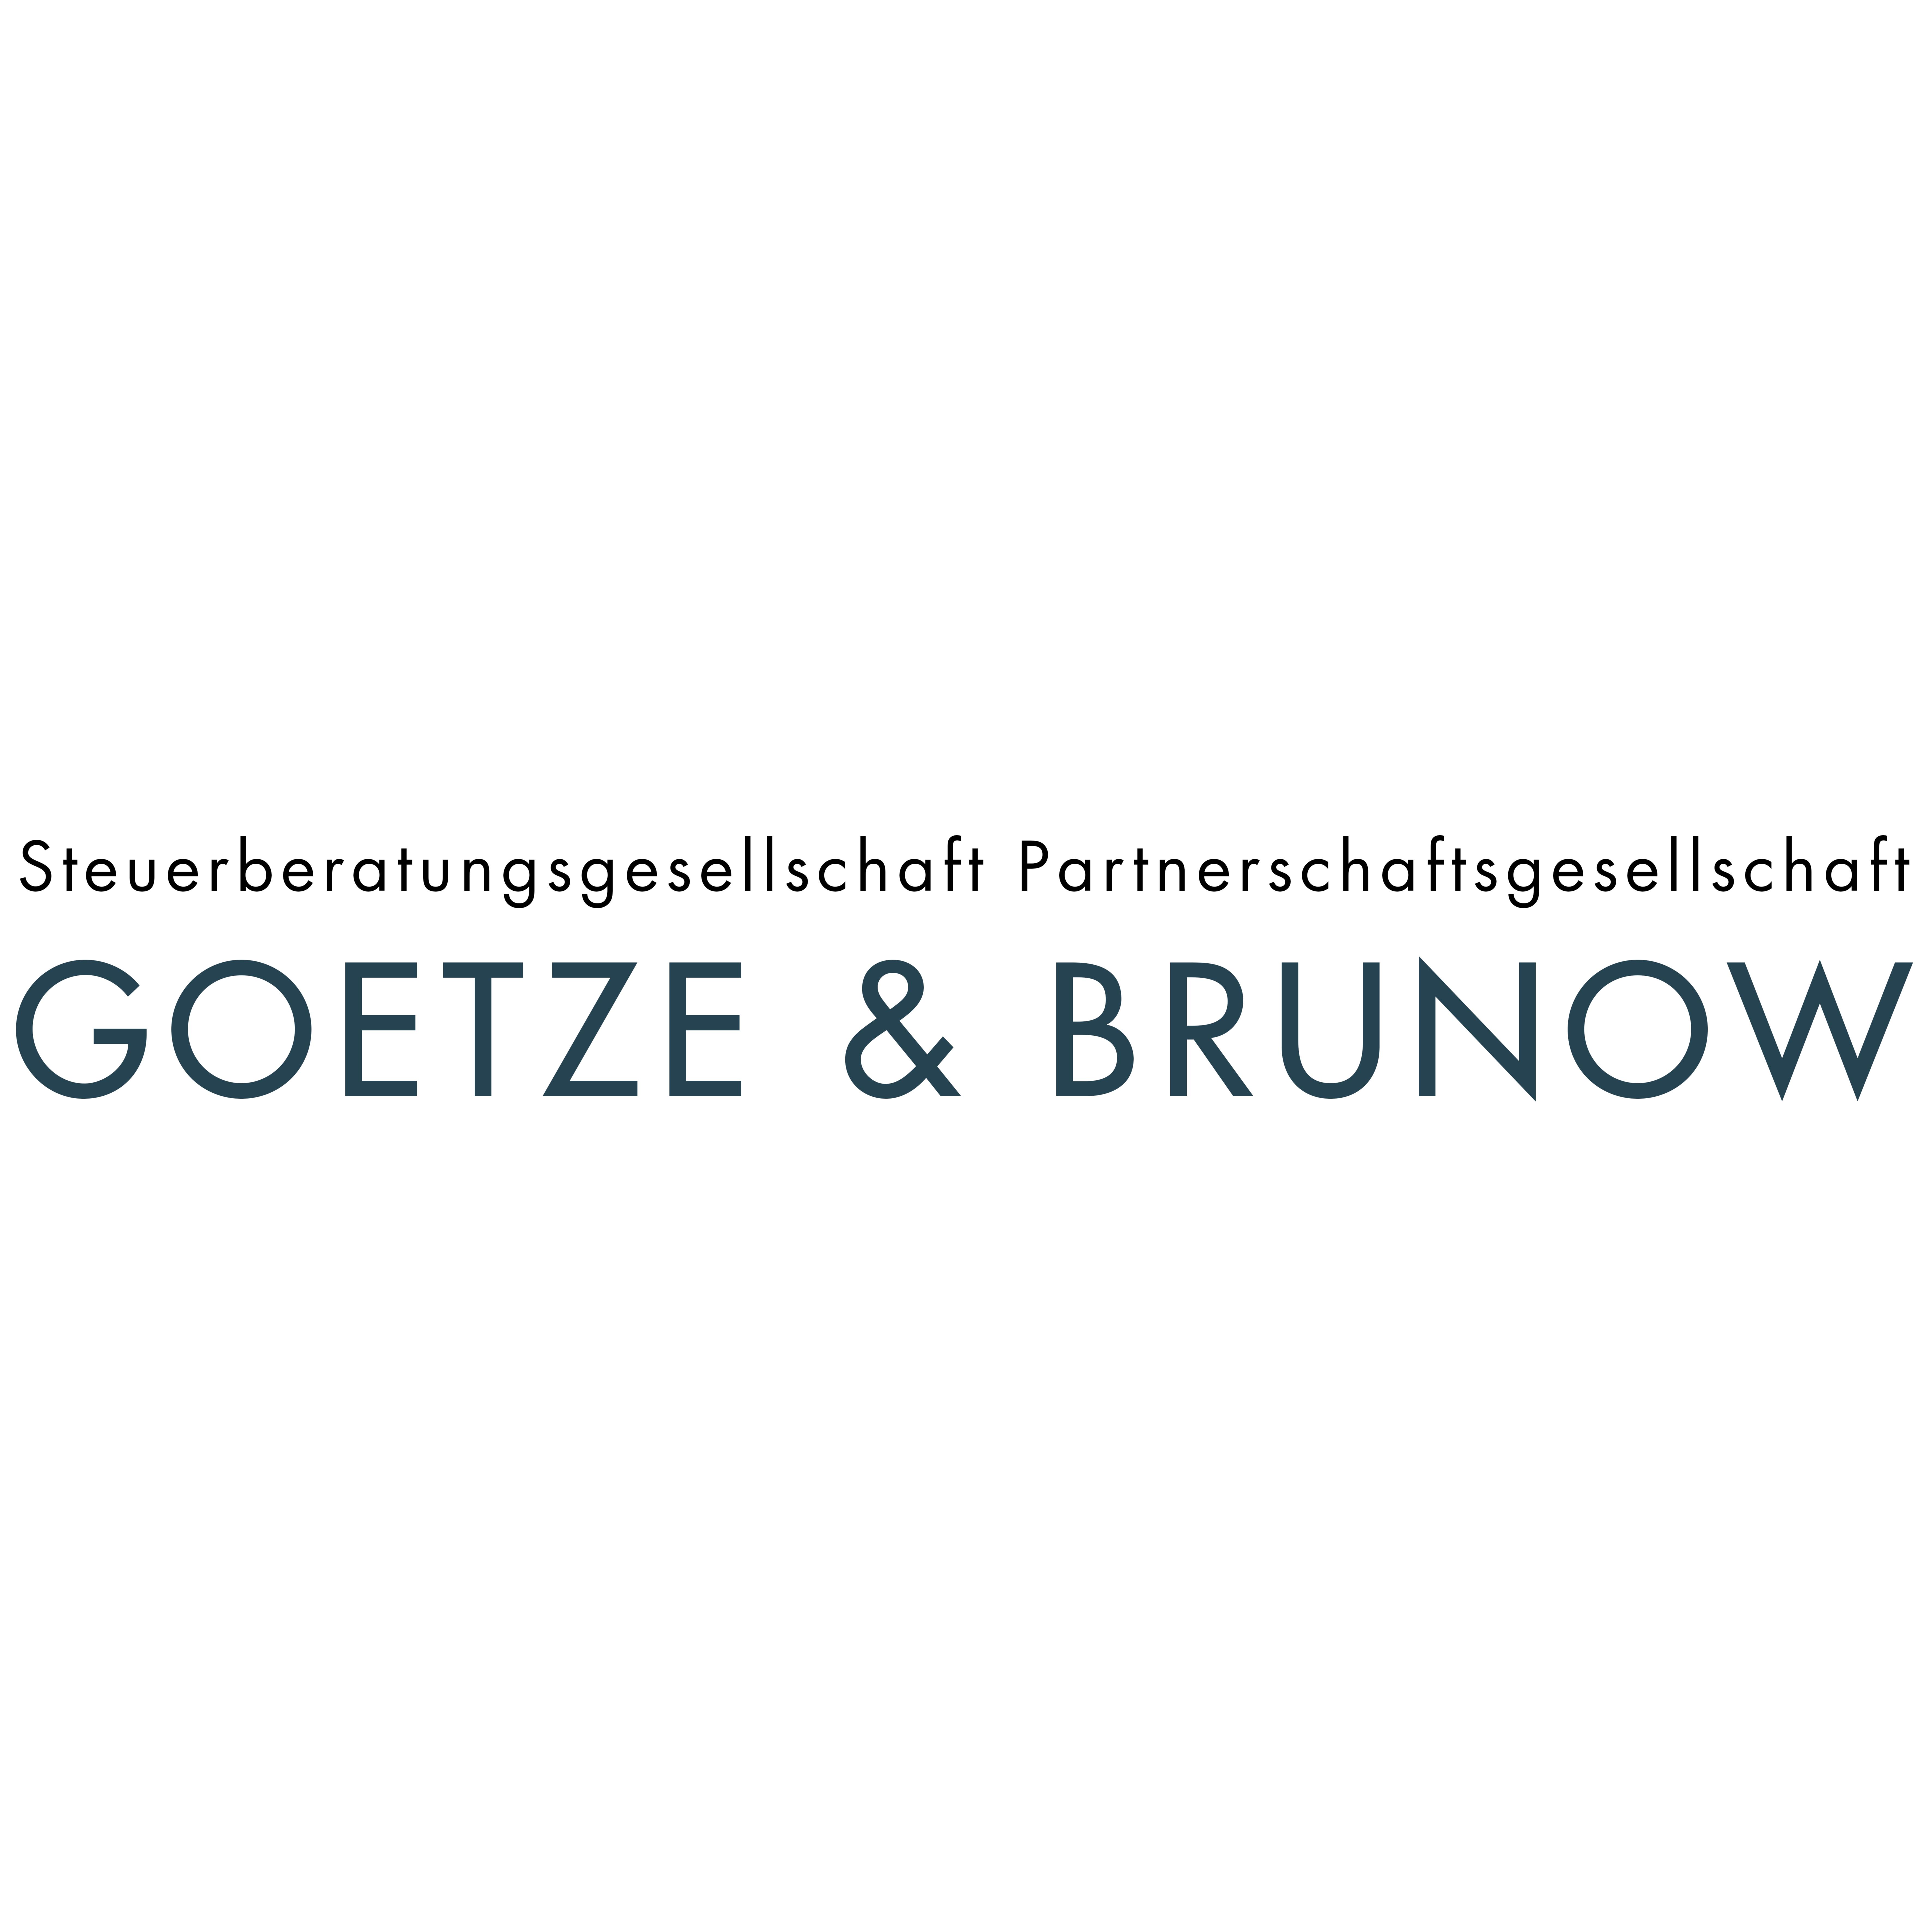 Bild zu Goetze & Brunow Steuerberatungsgesellschaft Partnerschaftsgesellschaft in Rathenow